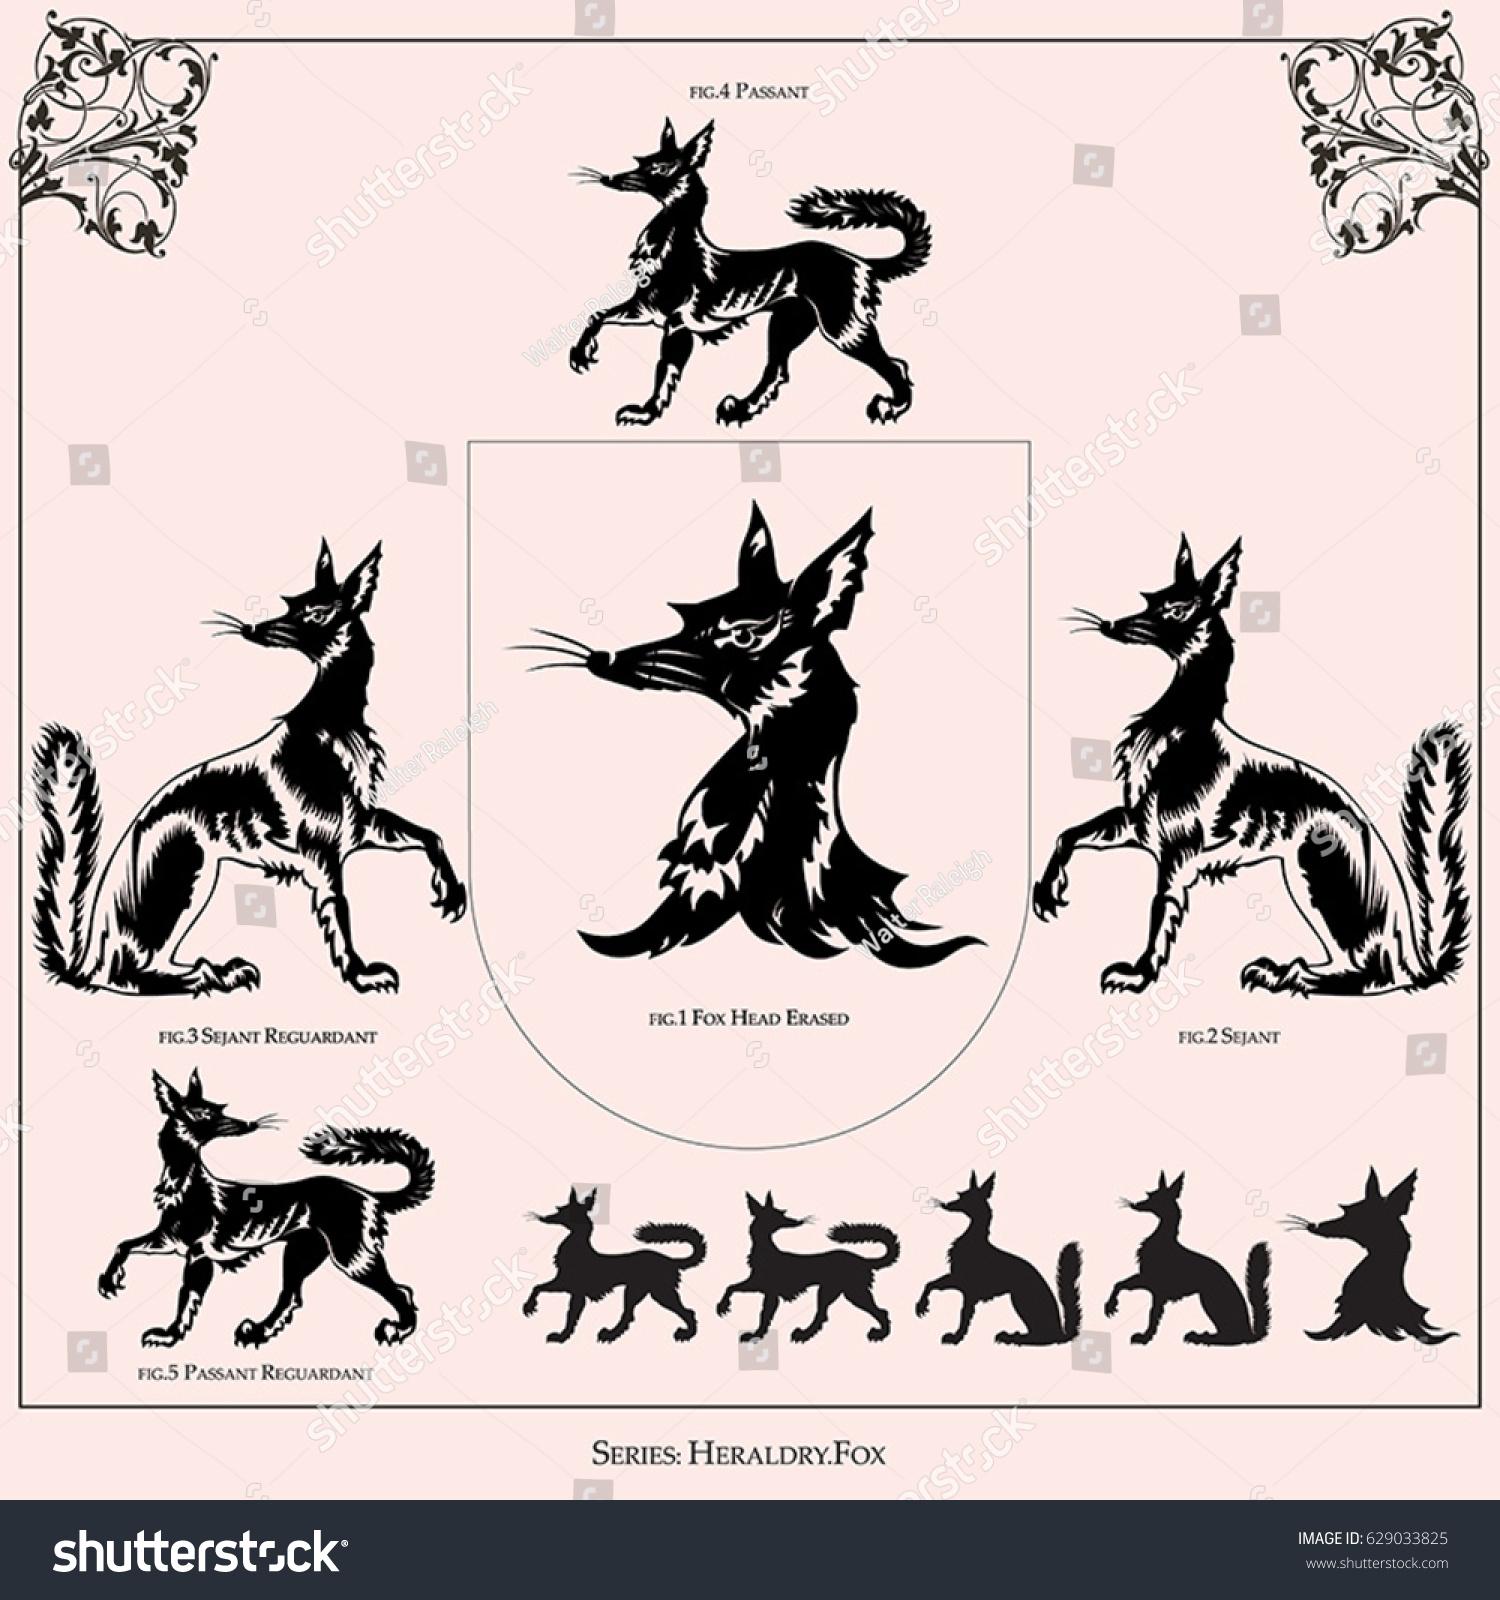 Heraldry: A Pictorial Archive for Artists and Designers Dover Pictorial  Archives Dover Pictorial Archive Series: Amazon.de: Fox-Davies, Arthur  Charles: Fremdsprachige Bücher